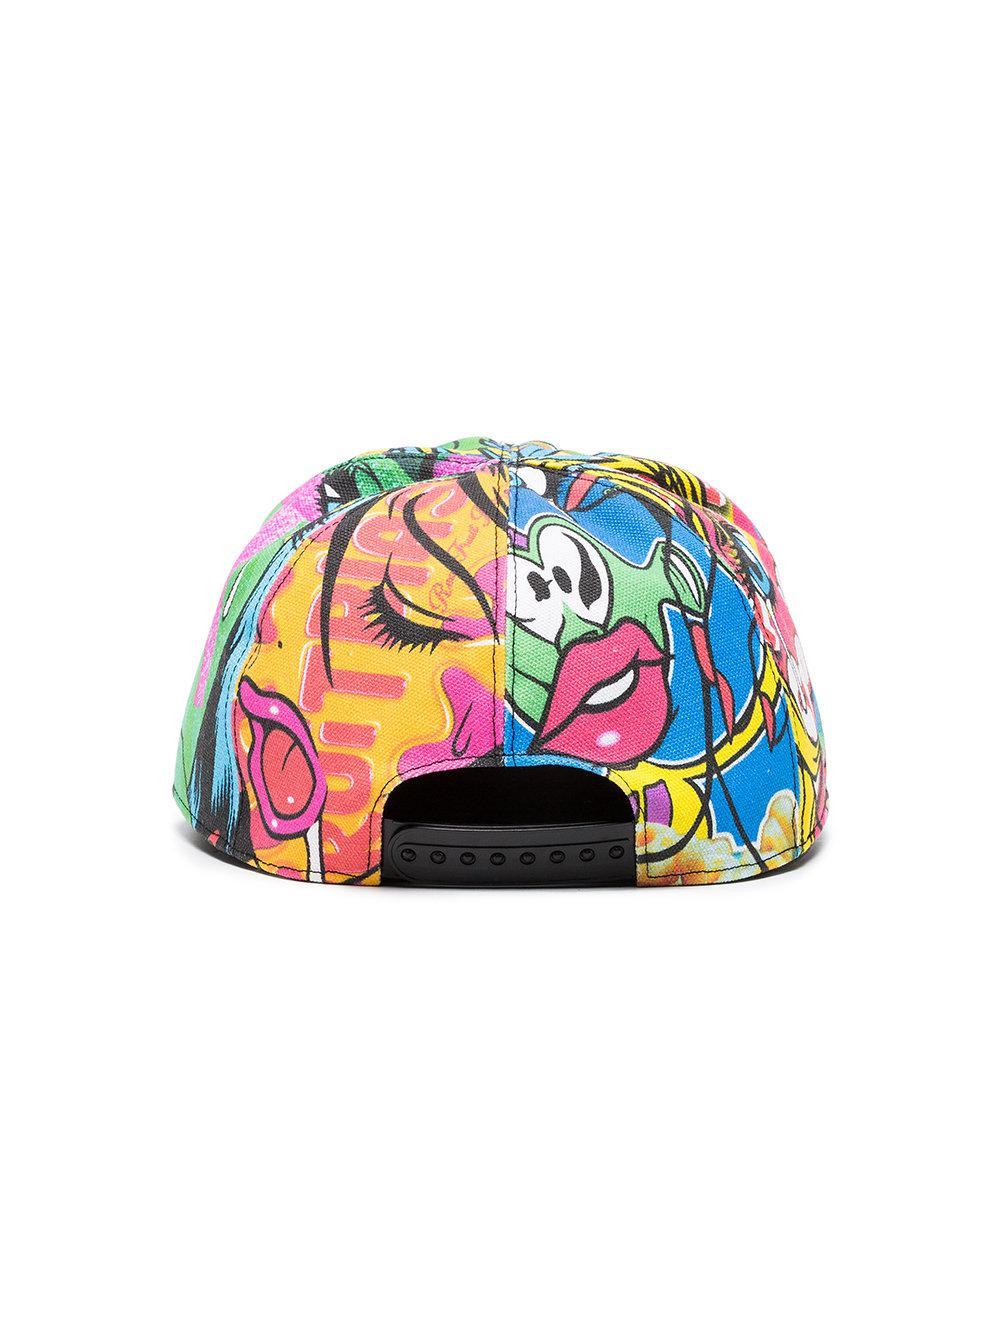 b33d1a20 Moschino - Multicolor Multicoloured Graphic Visor Cap - Lyst. View  fullscreen